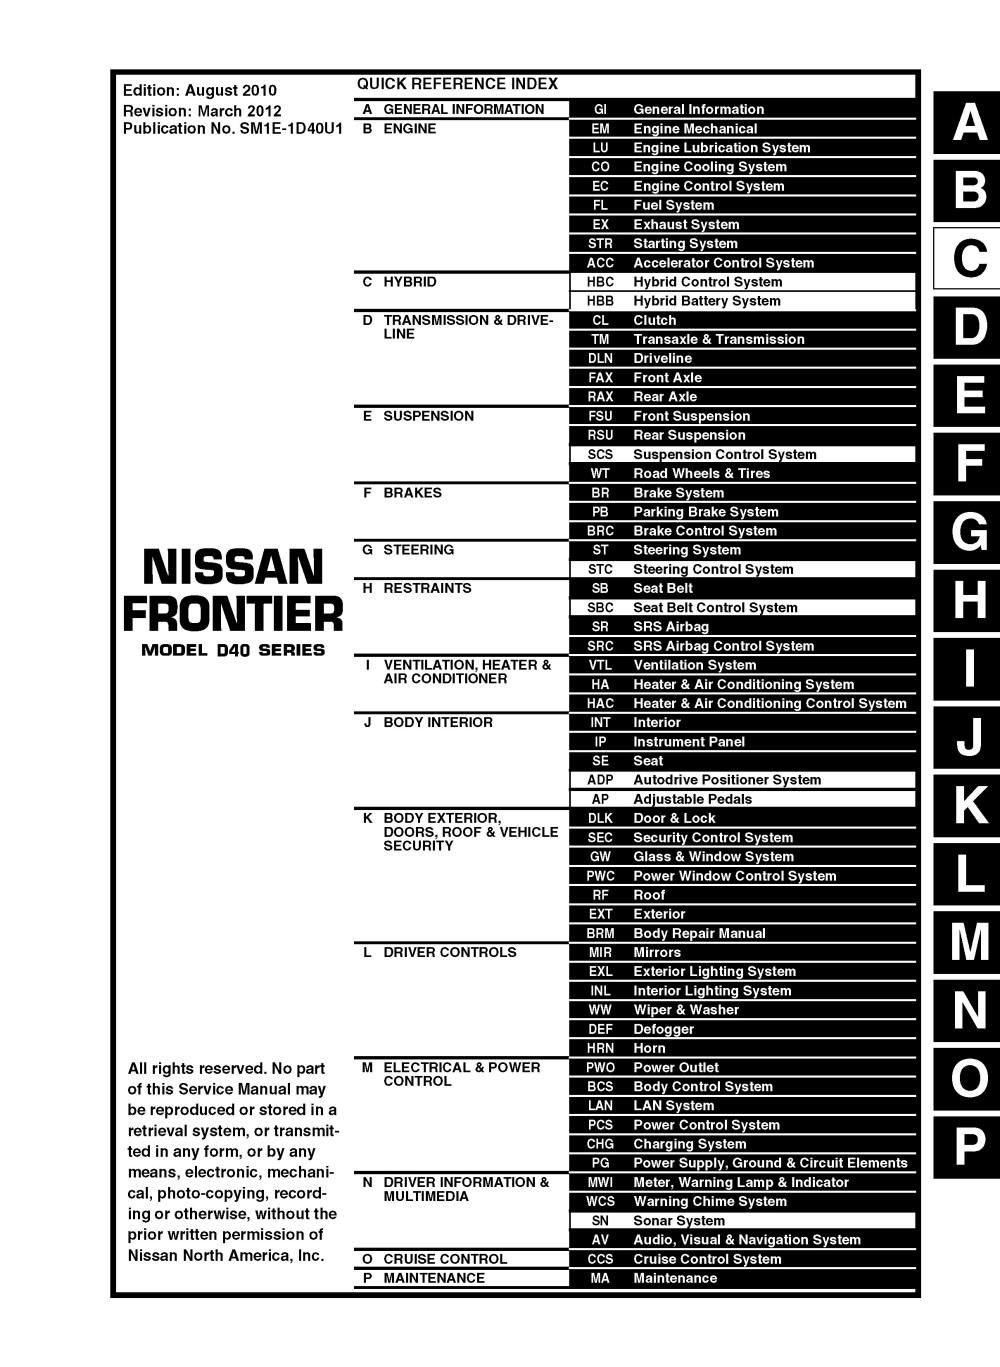 medium resolution of 2011 nissan frontier d40 oem service and repair manual pdf